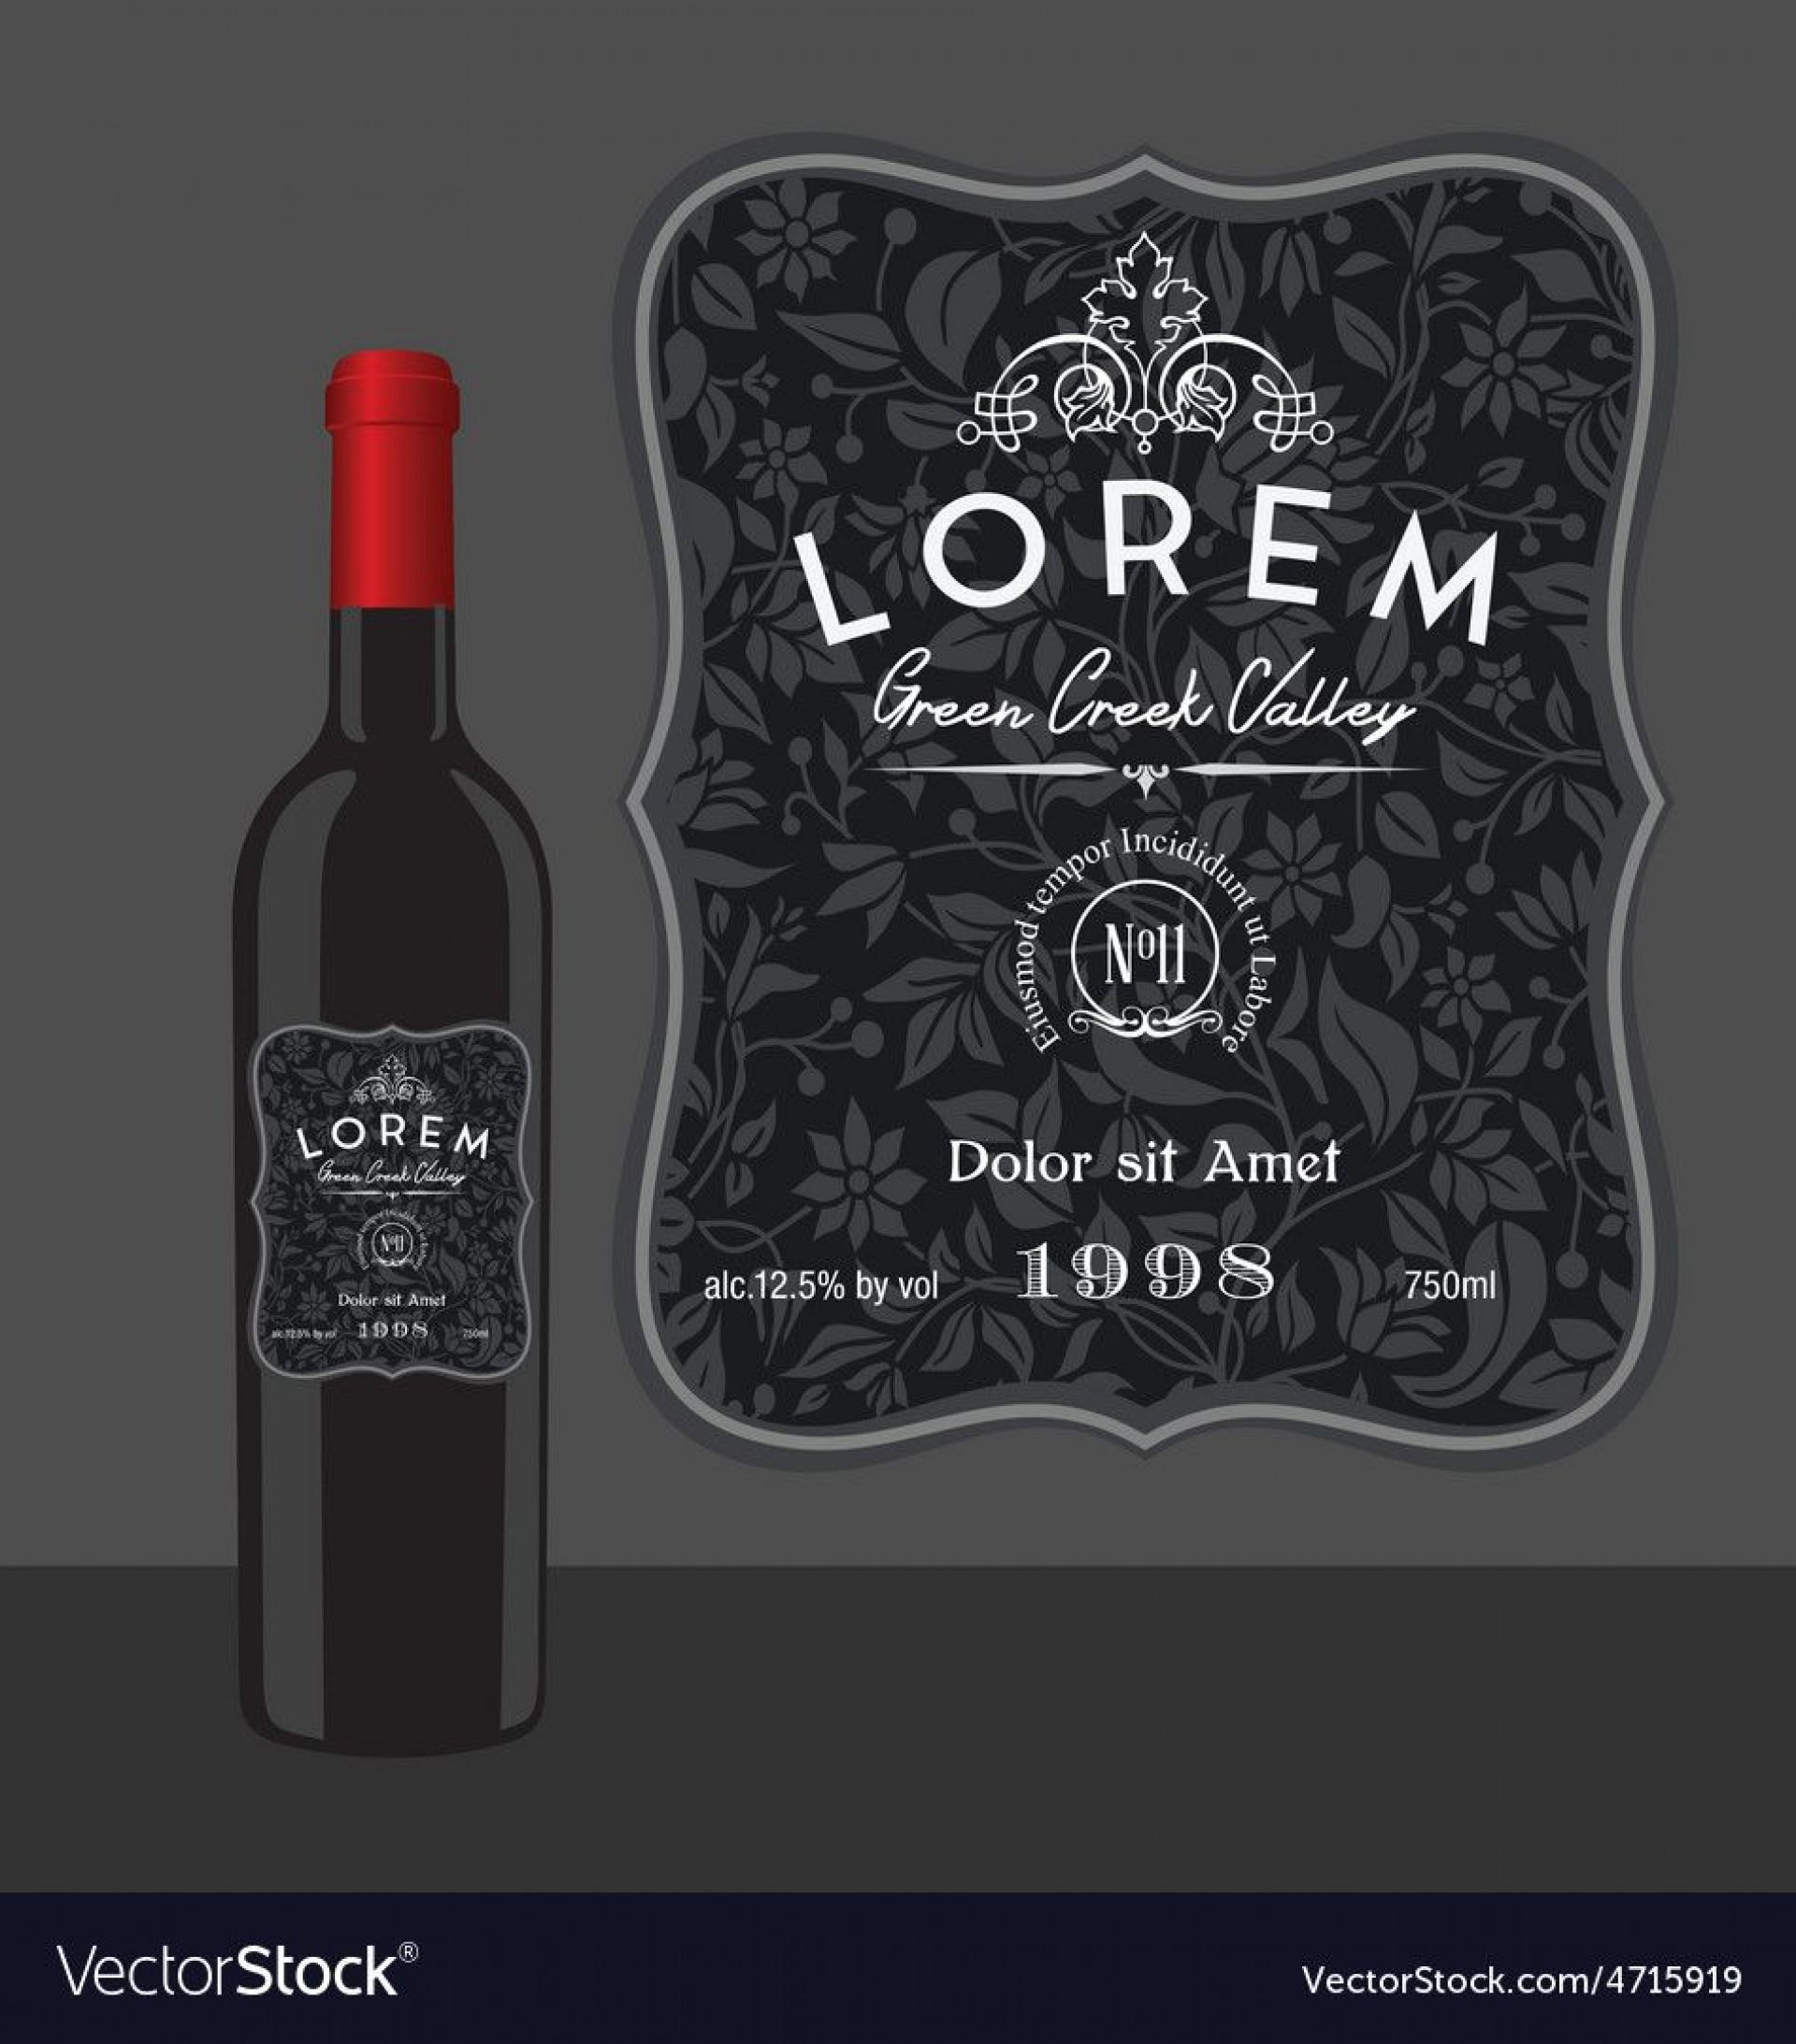 005 Amazing Free Wine Bottle Label Template Highest Clarity  Mini Printable1920